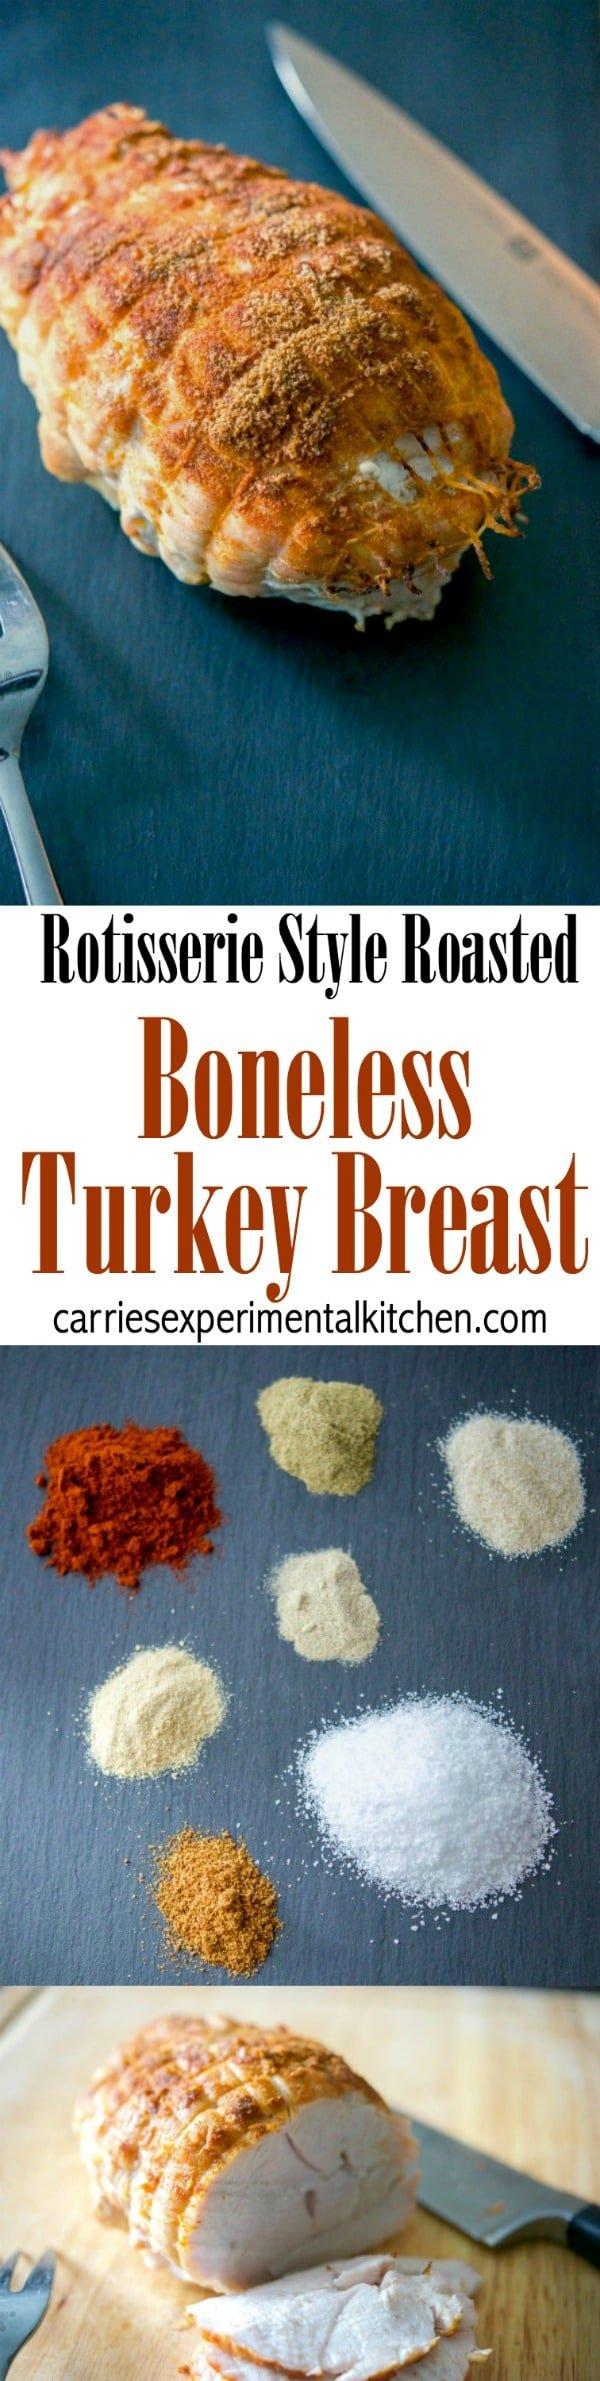 Boneless turkey breast seasoned with rotisserie seasonings including paprika, thyme, garlic and onion powder, salt, white and cayenne pepper. #thanksgiving #turkey #sundaydinner